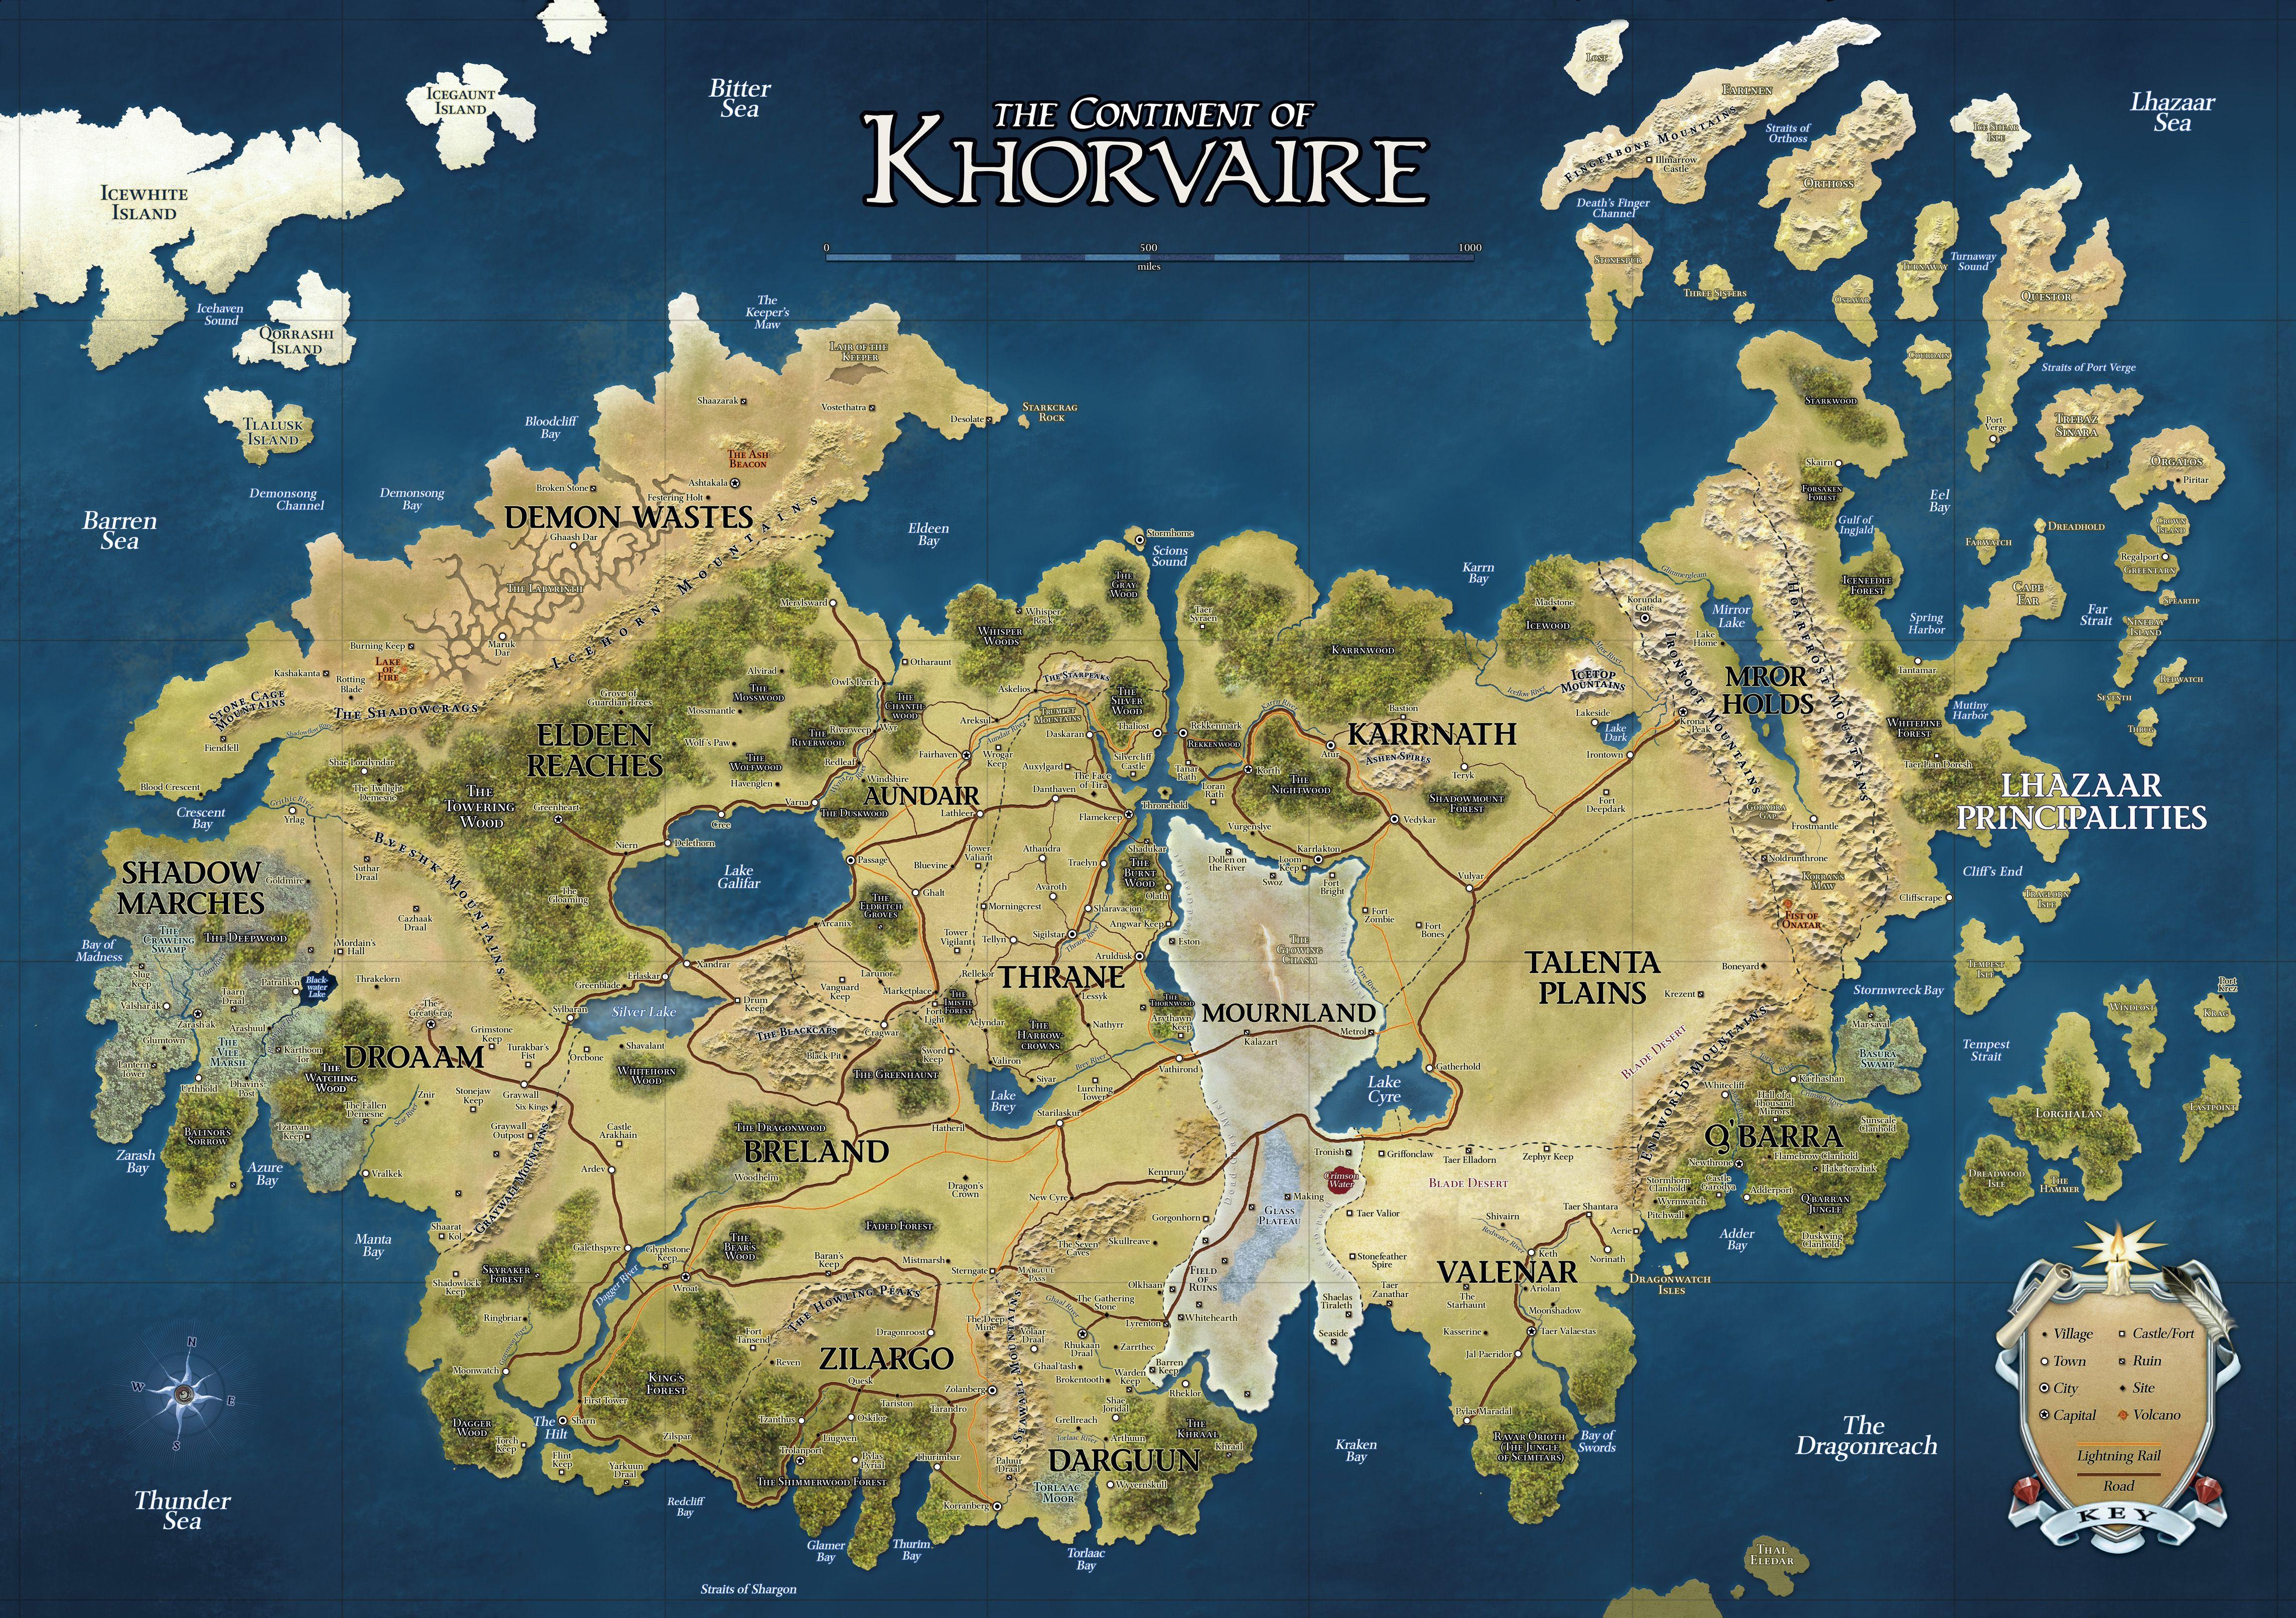 the riyria chronicles map, unicorn chronicles luster of a map, powder mage trilogy map, terry pratchett discworld map, jim butcher codex alera map, on kingkiller chronicles map